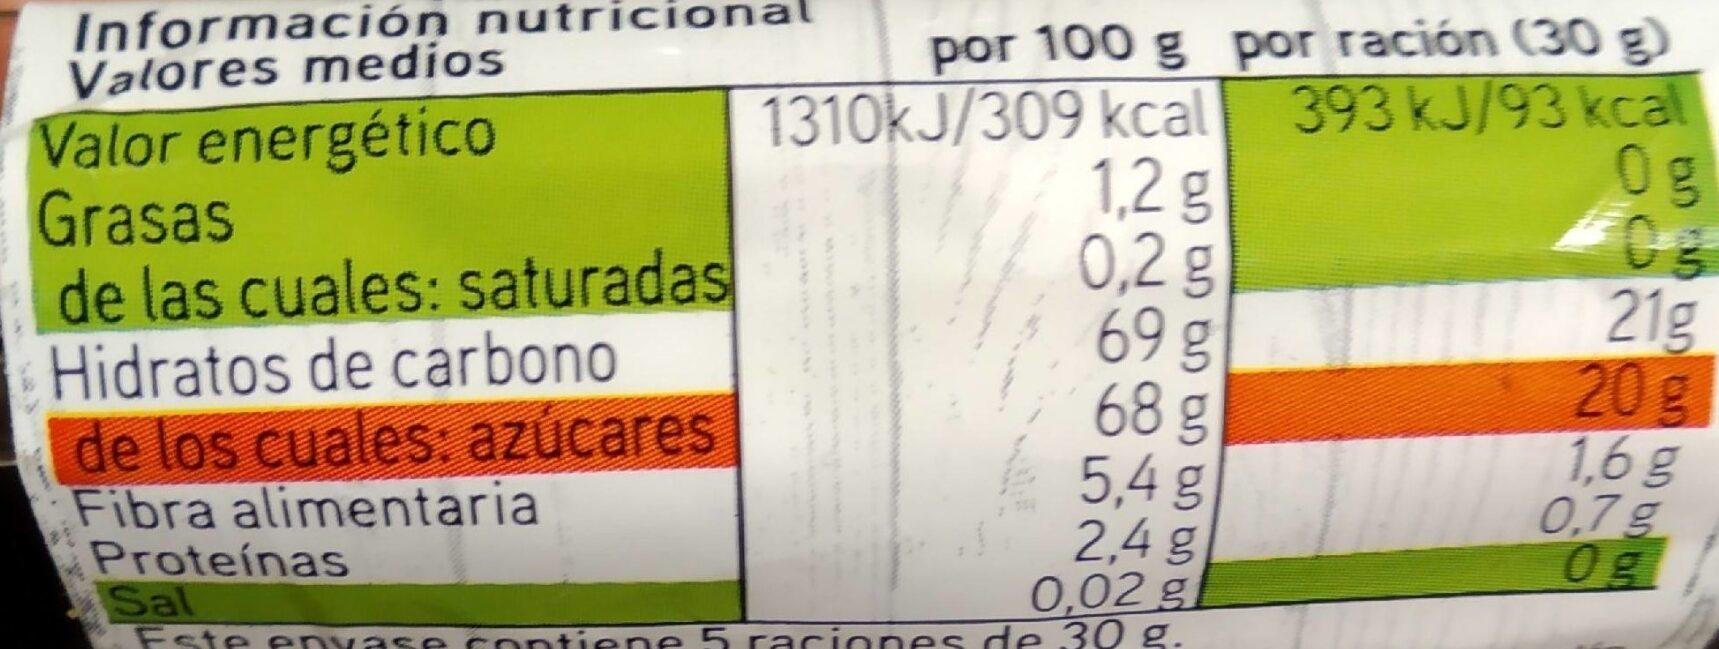 Frutas desecadas Pasa Thompson - Informations nutritionnelles - es